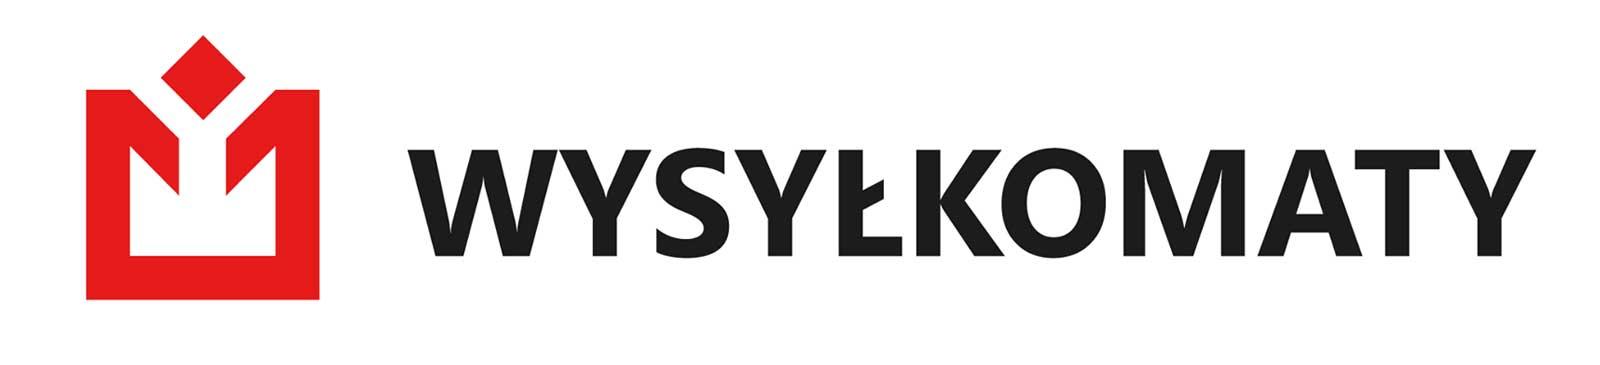 Wysylkomaty Logo